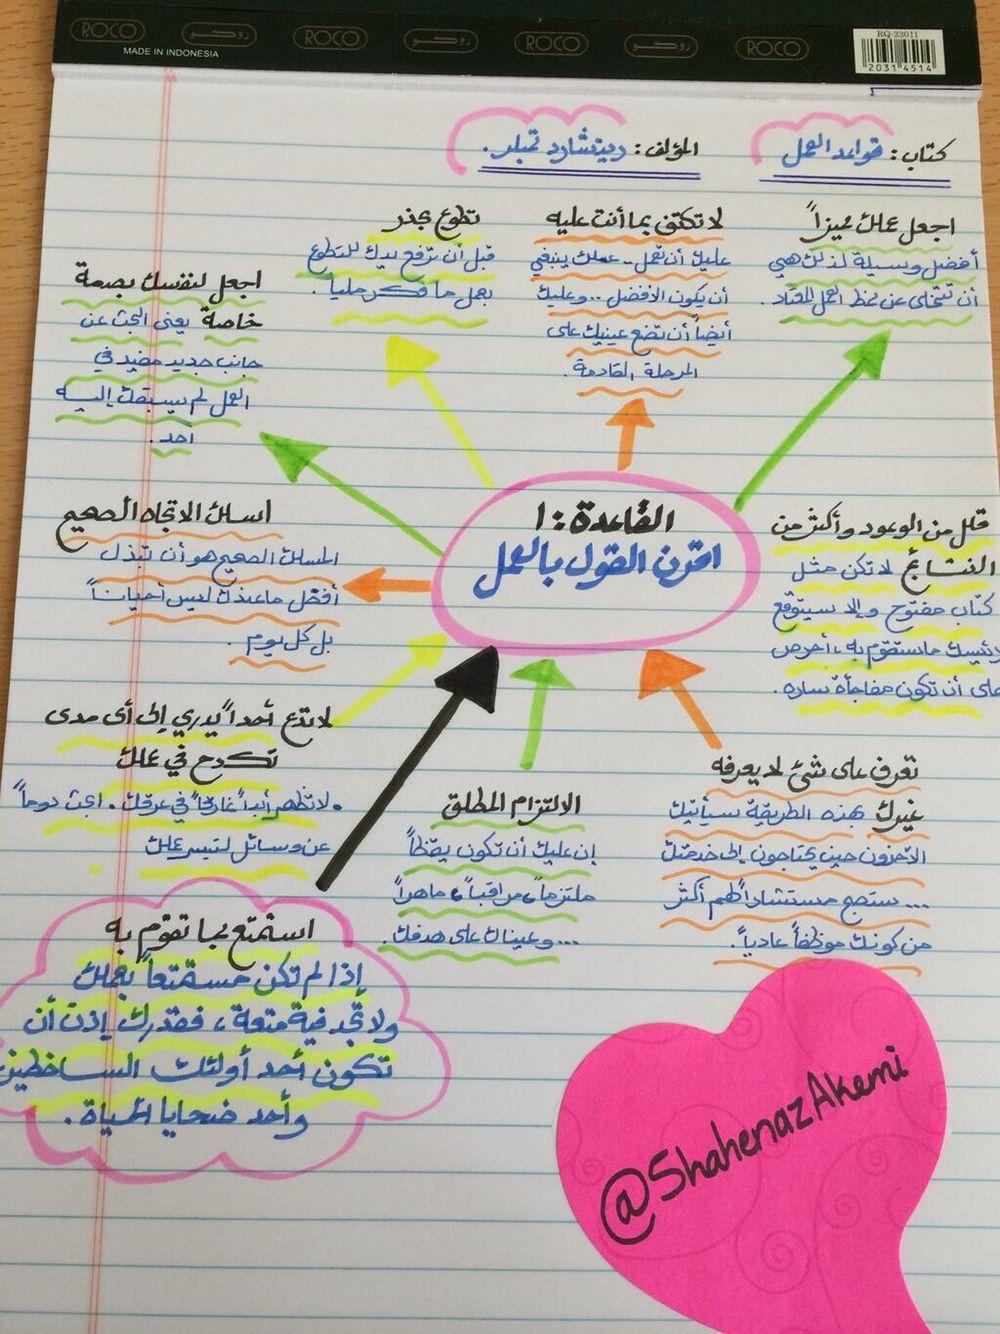 قواعد العمل Learning Websites Positive Notes Book Qoutes